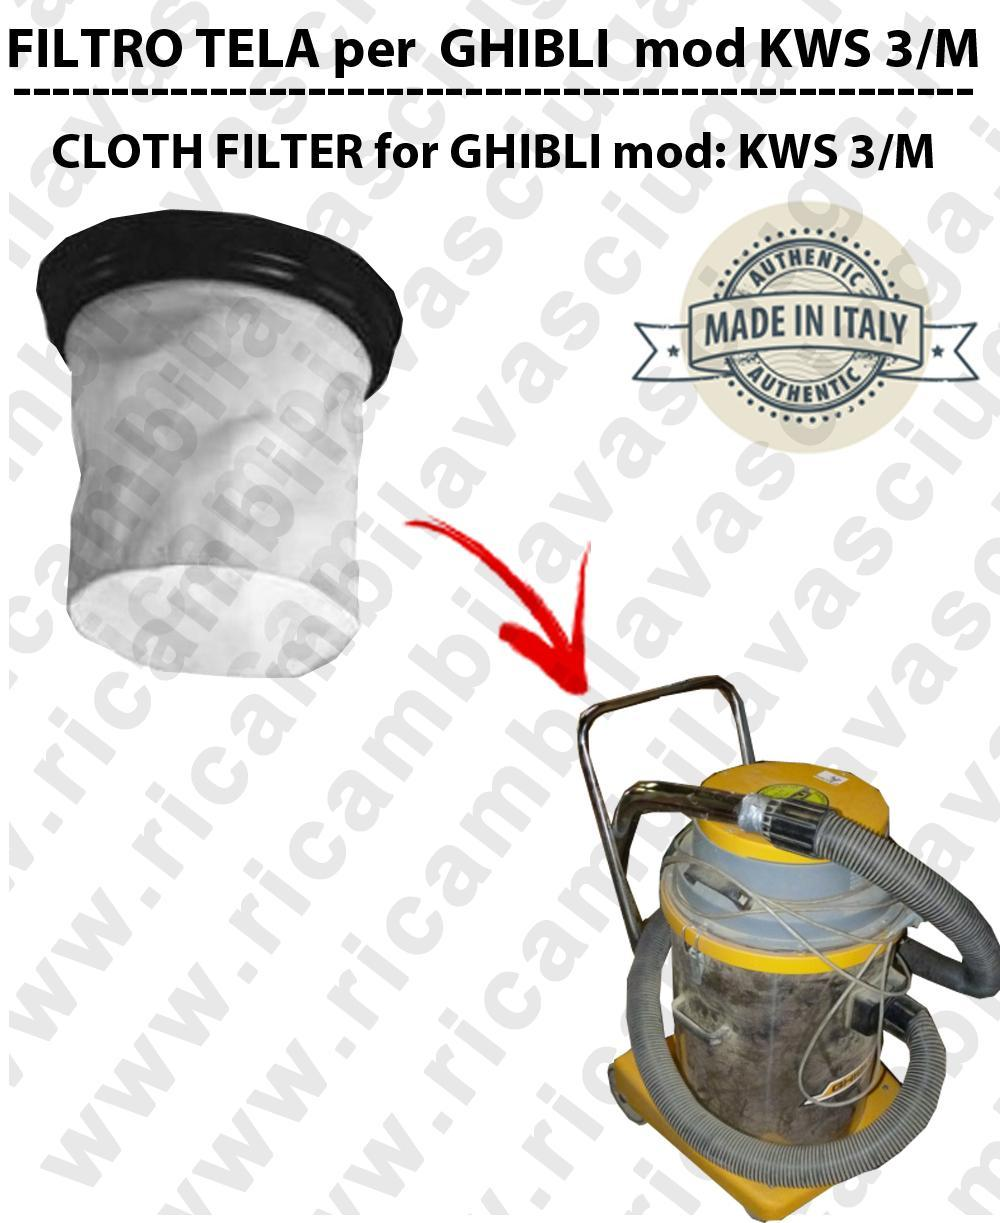 Filtro de tela para aspiradora GHIBLI Model KWS 3/M